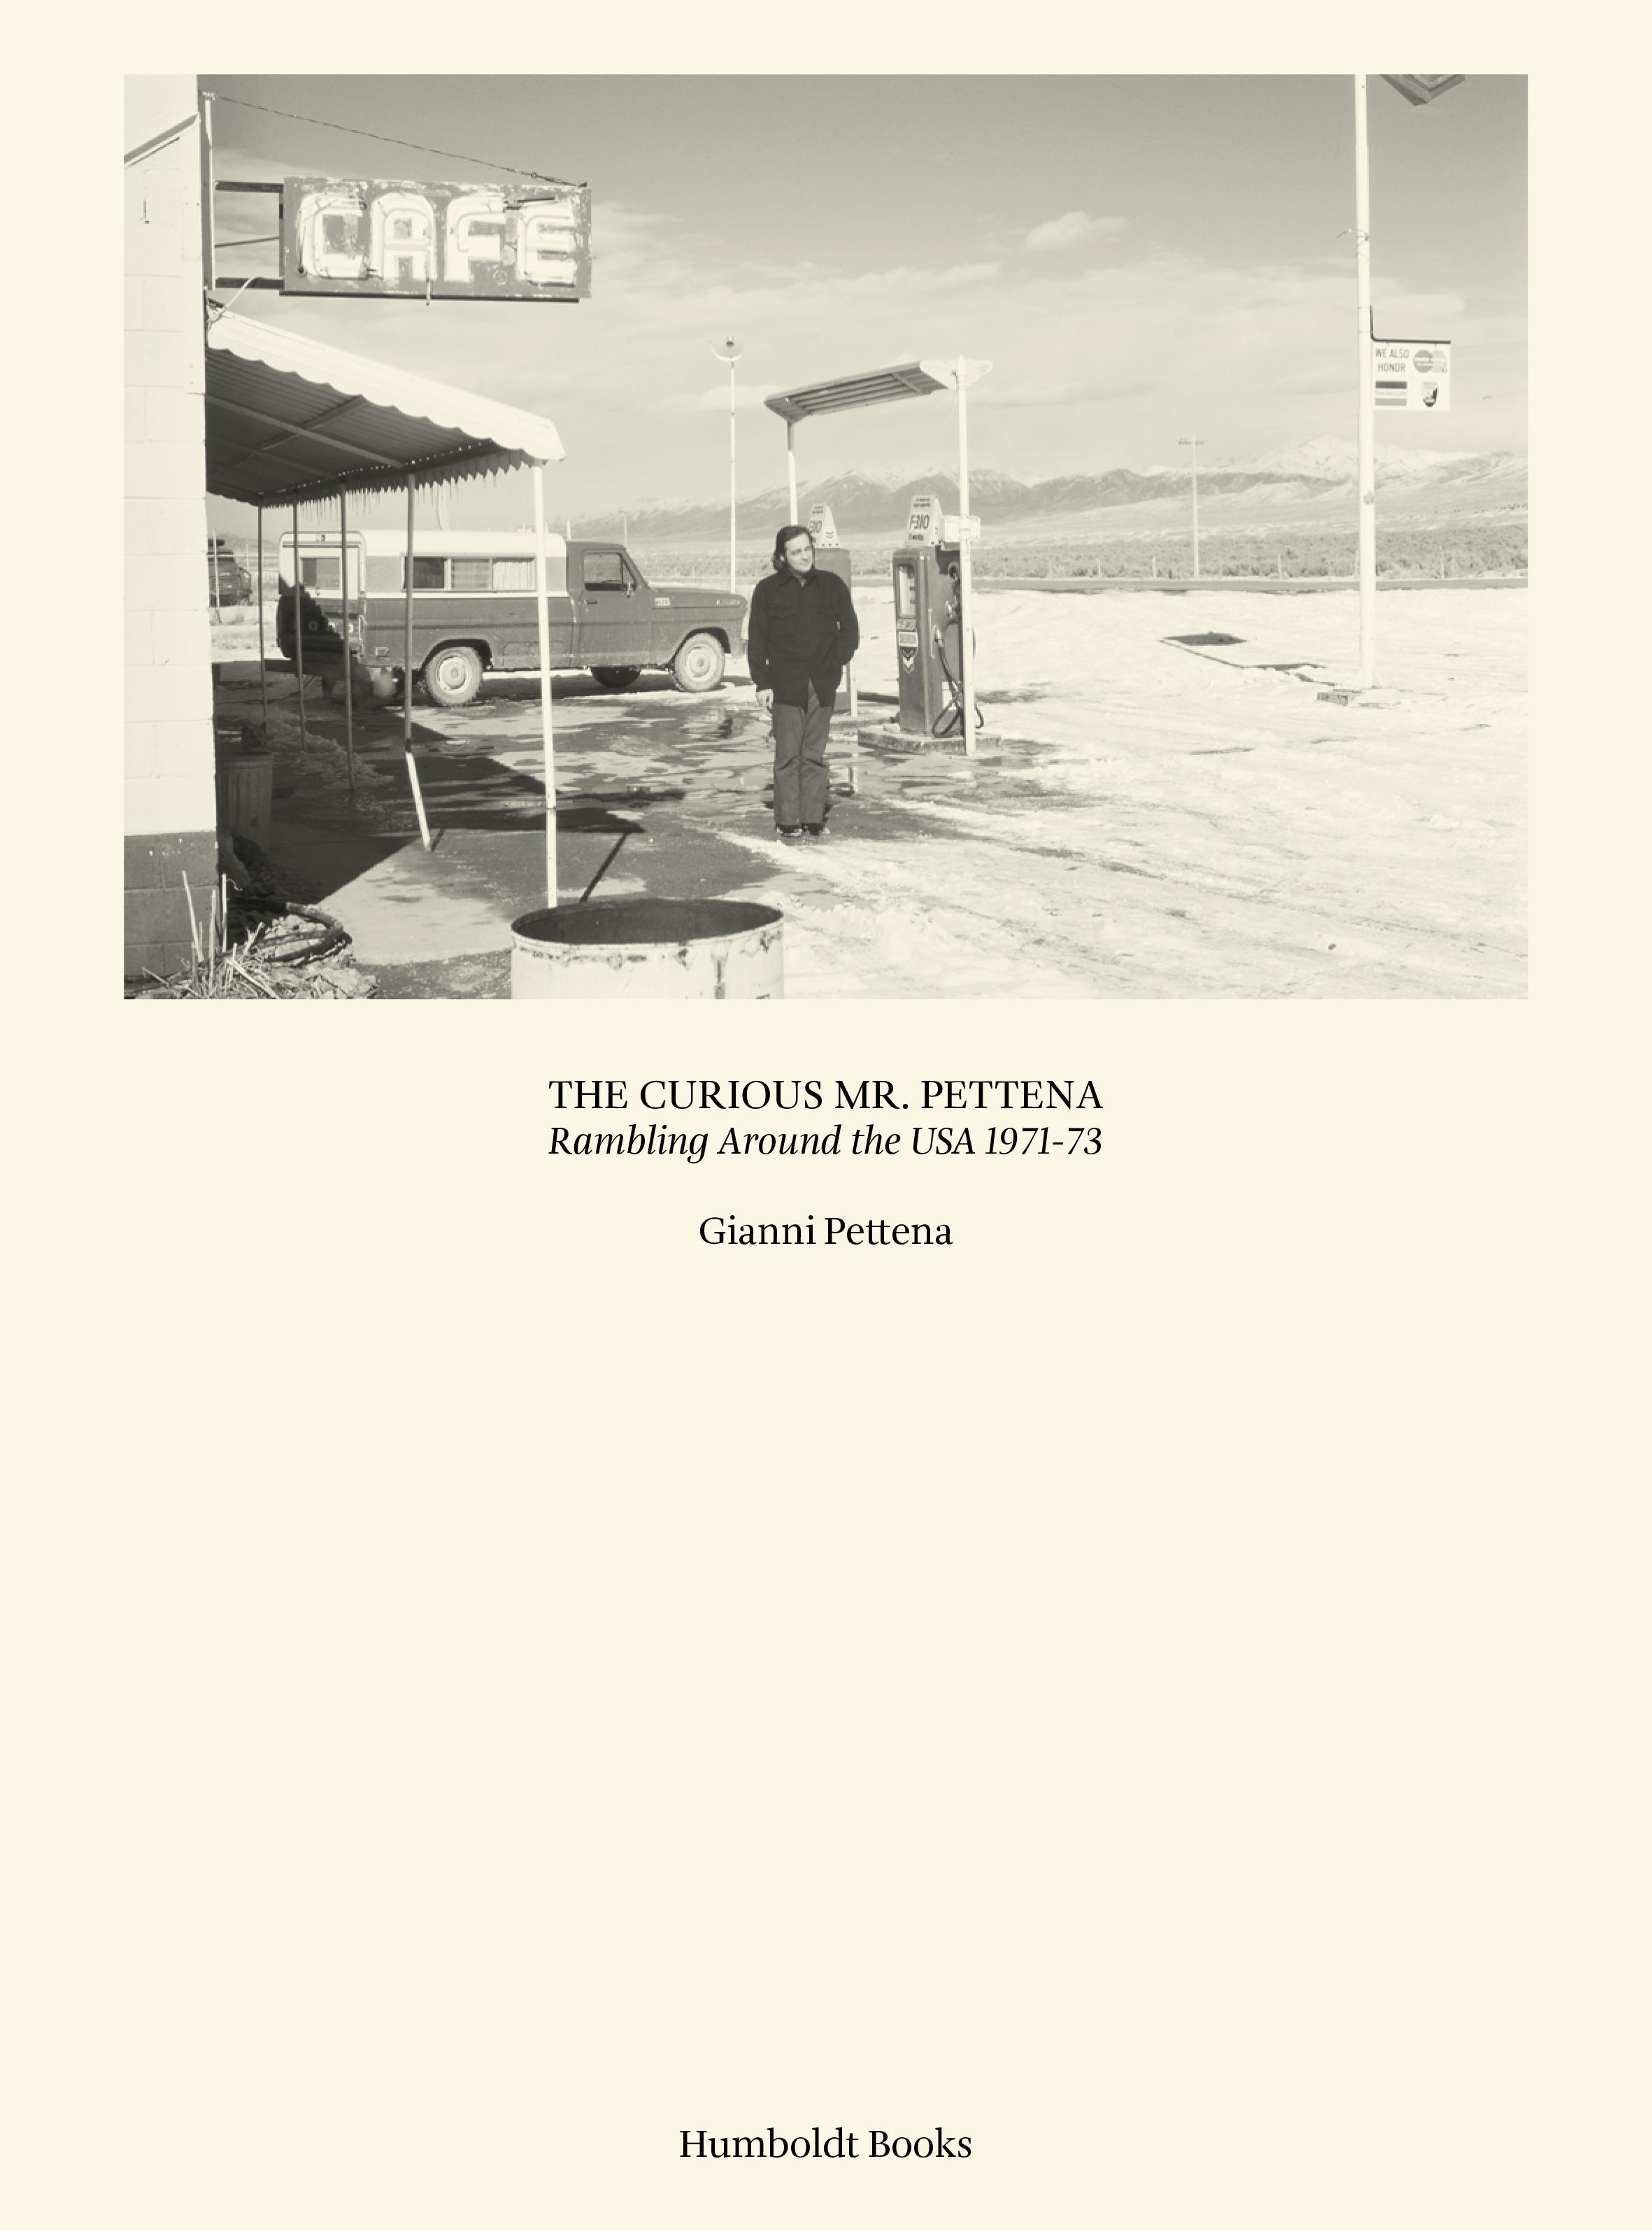 THE CURIOUS MR. PETTENA - RAMBLING AROUND USA - 1971-73